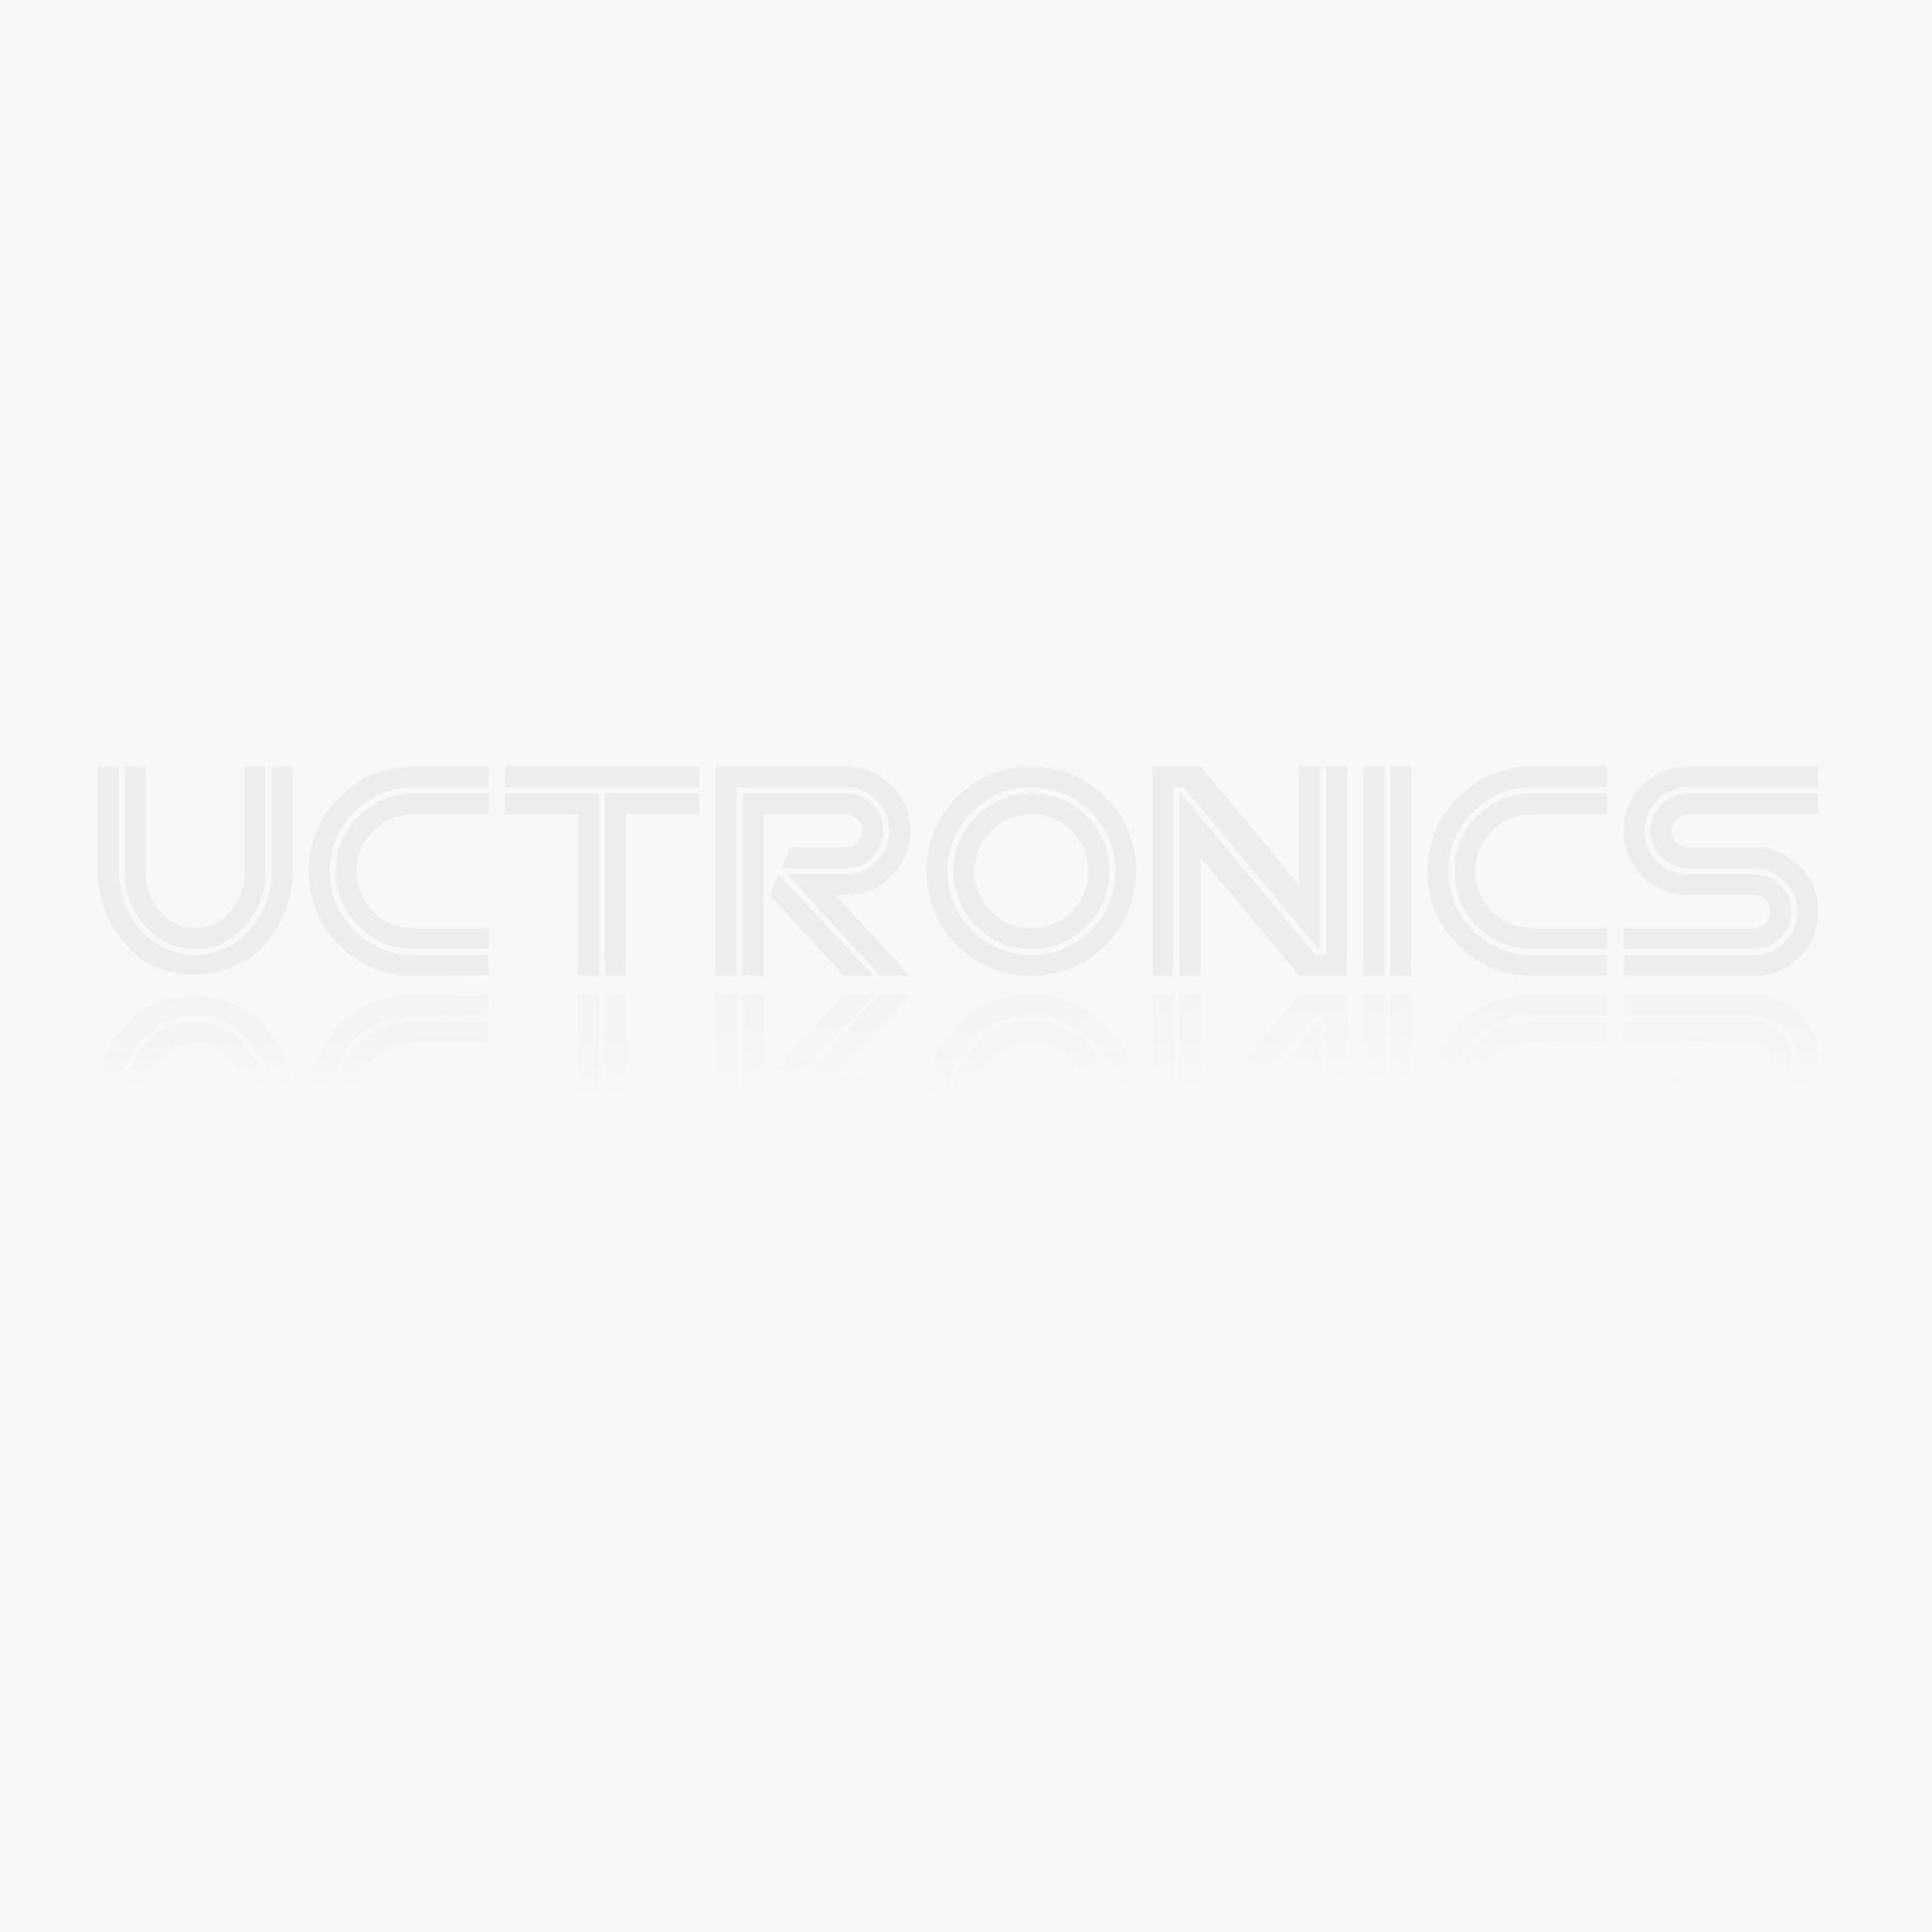 ATmega328P-PU with Arduino UNO bootloader